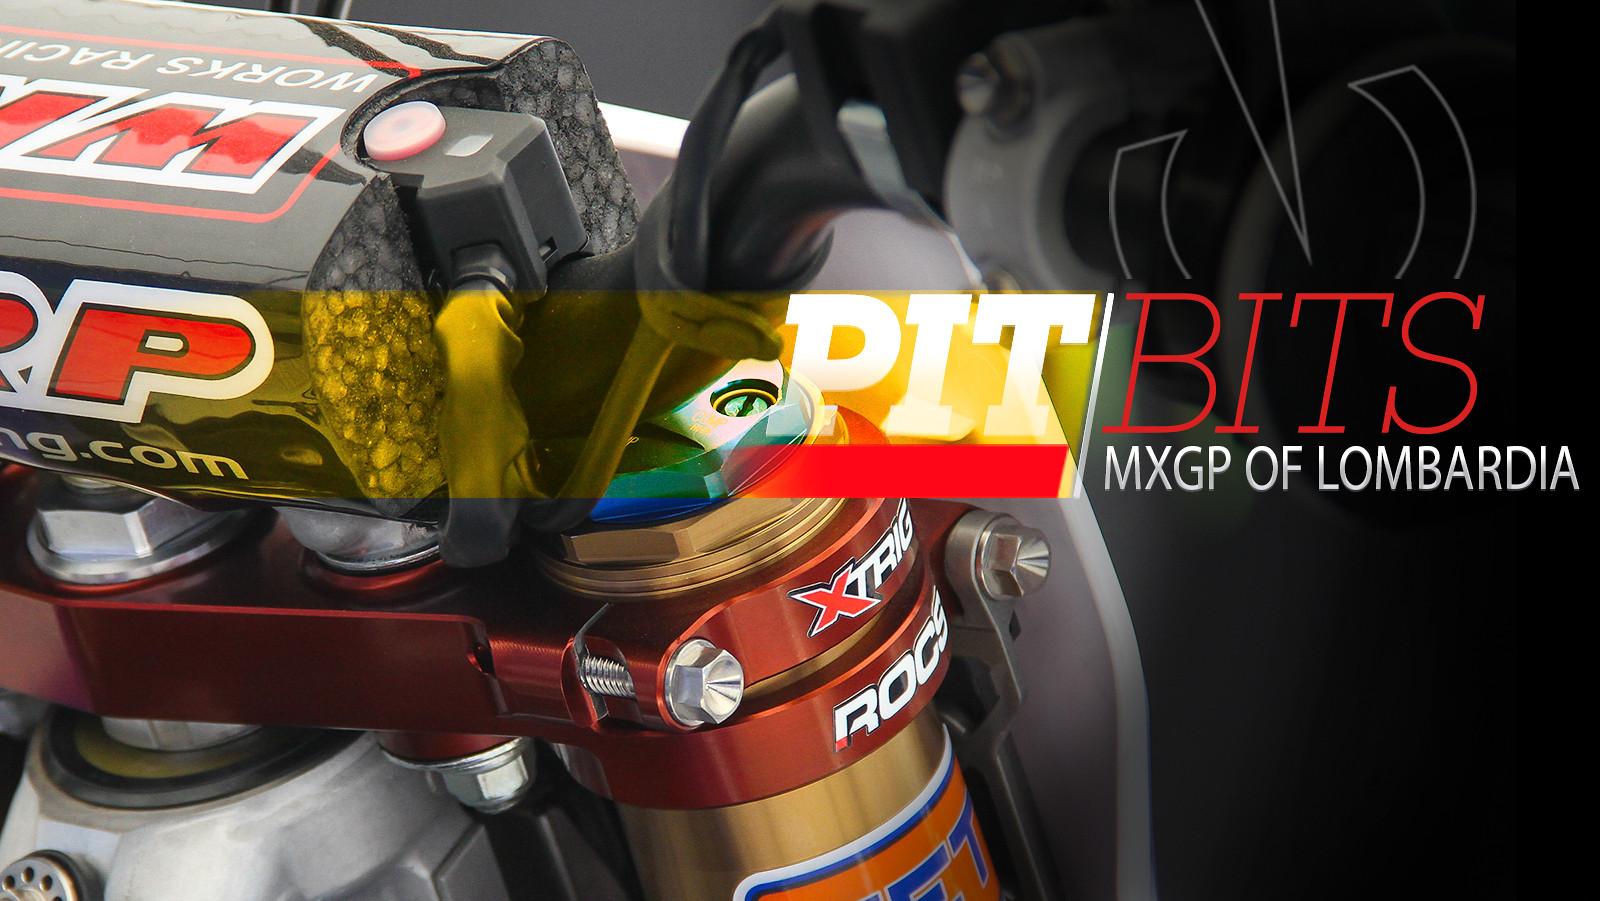 2017 MXGP of Lombardia - Vital MX Pit Bits - ayearinmx - Motocross Pictures - Vital MX